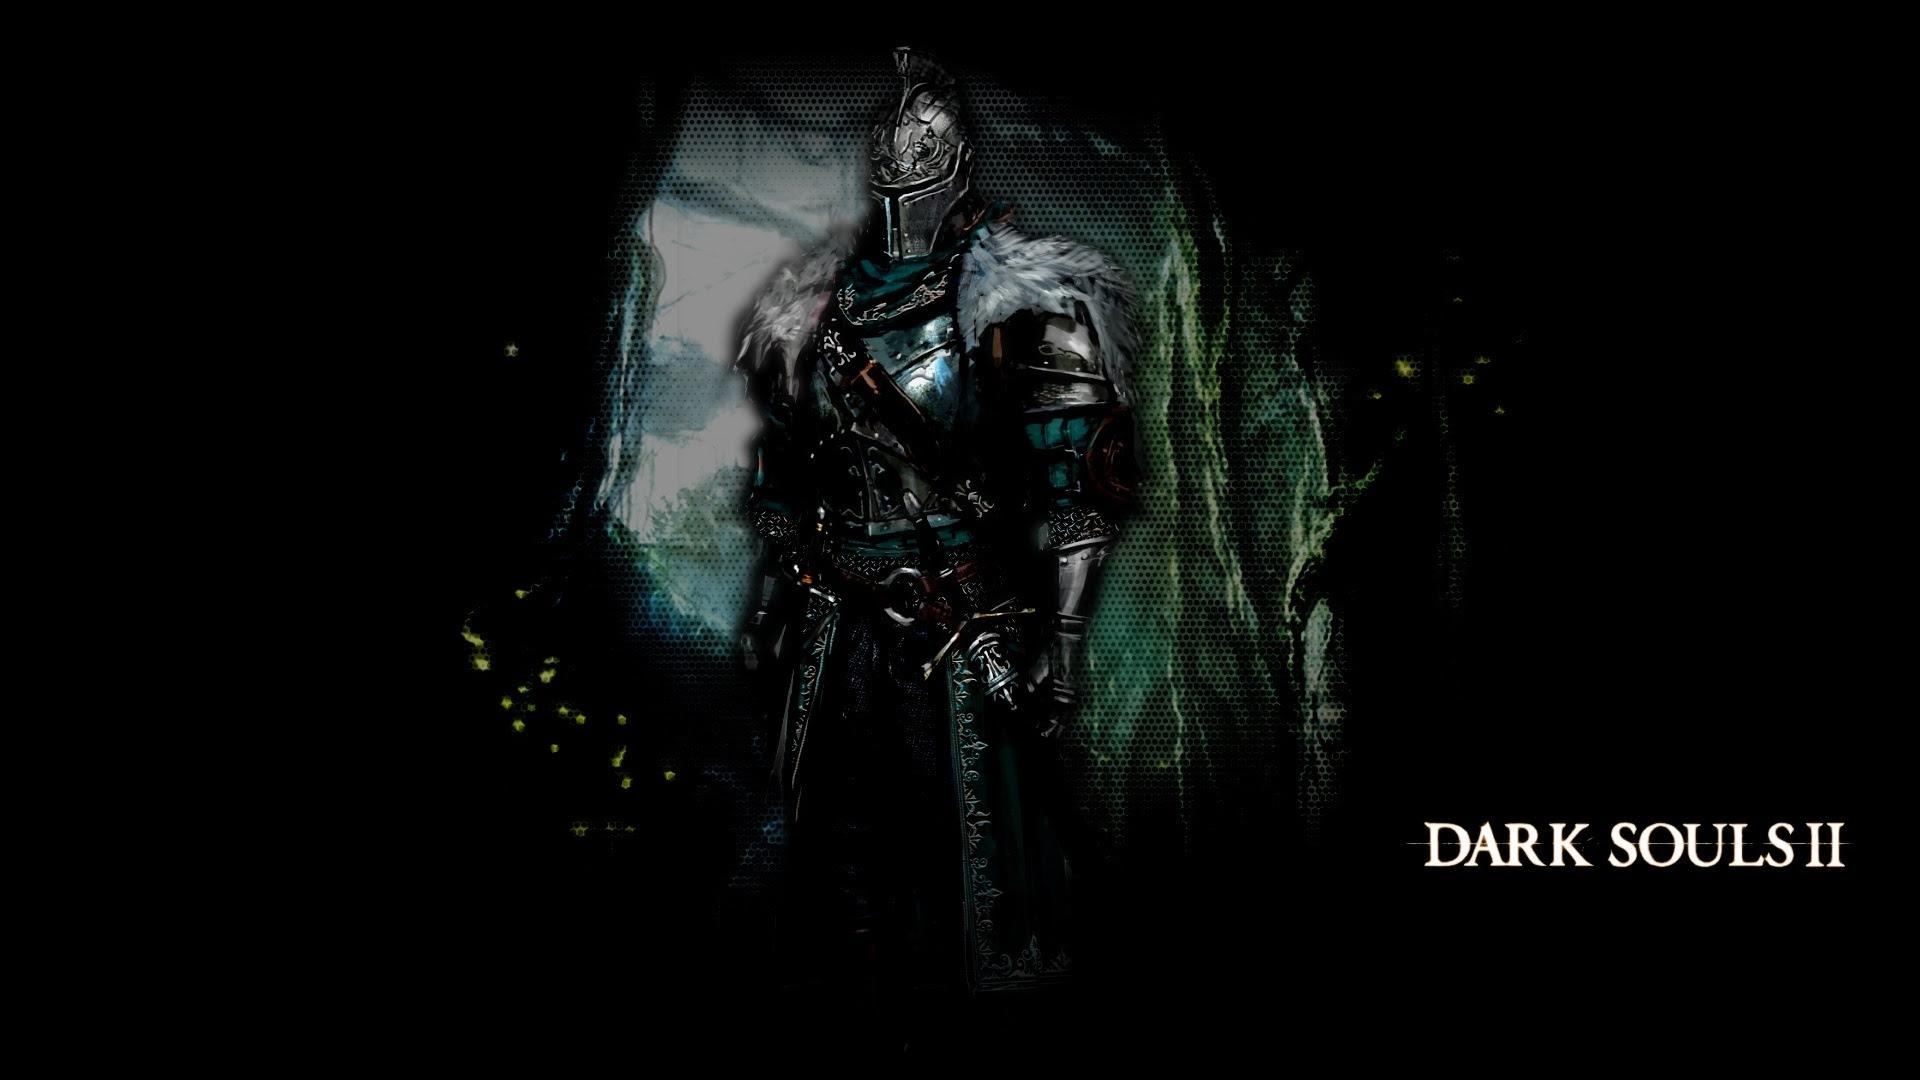 Dark Souls 2 Game Hd Wallpapers 2 1920x1080 Wallpaper Download